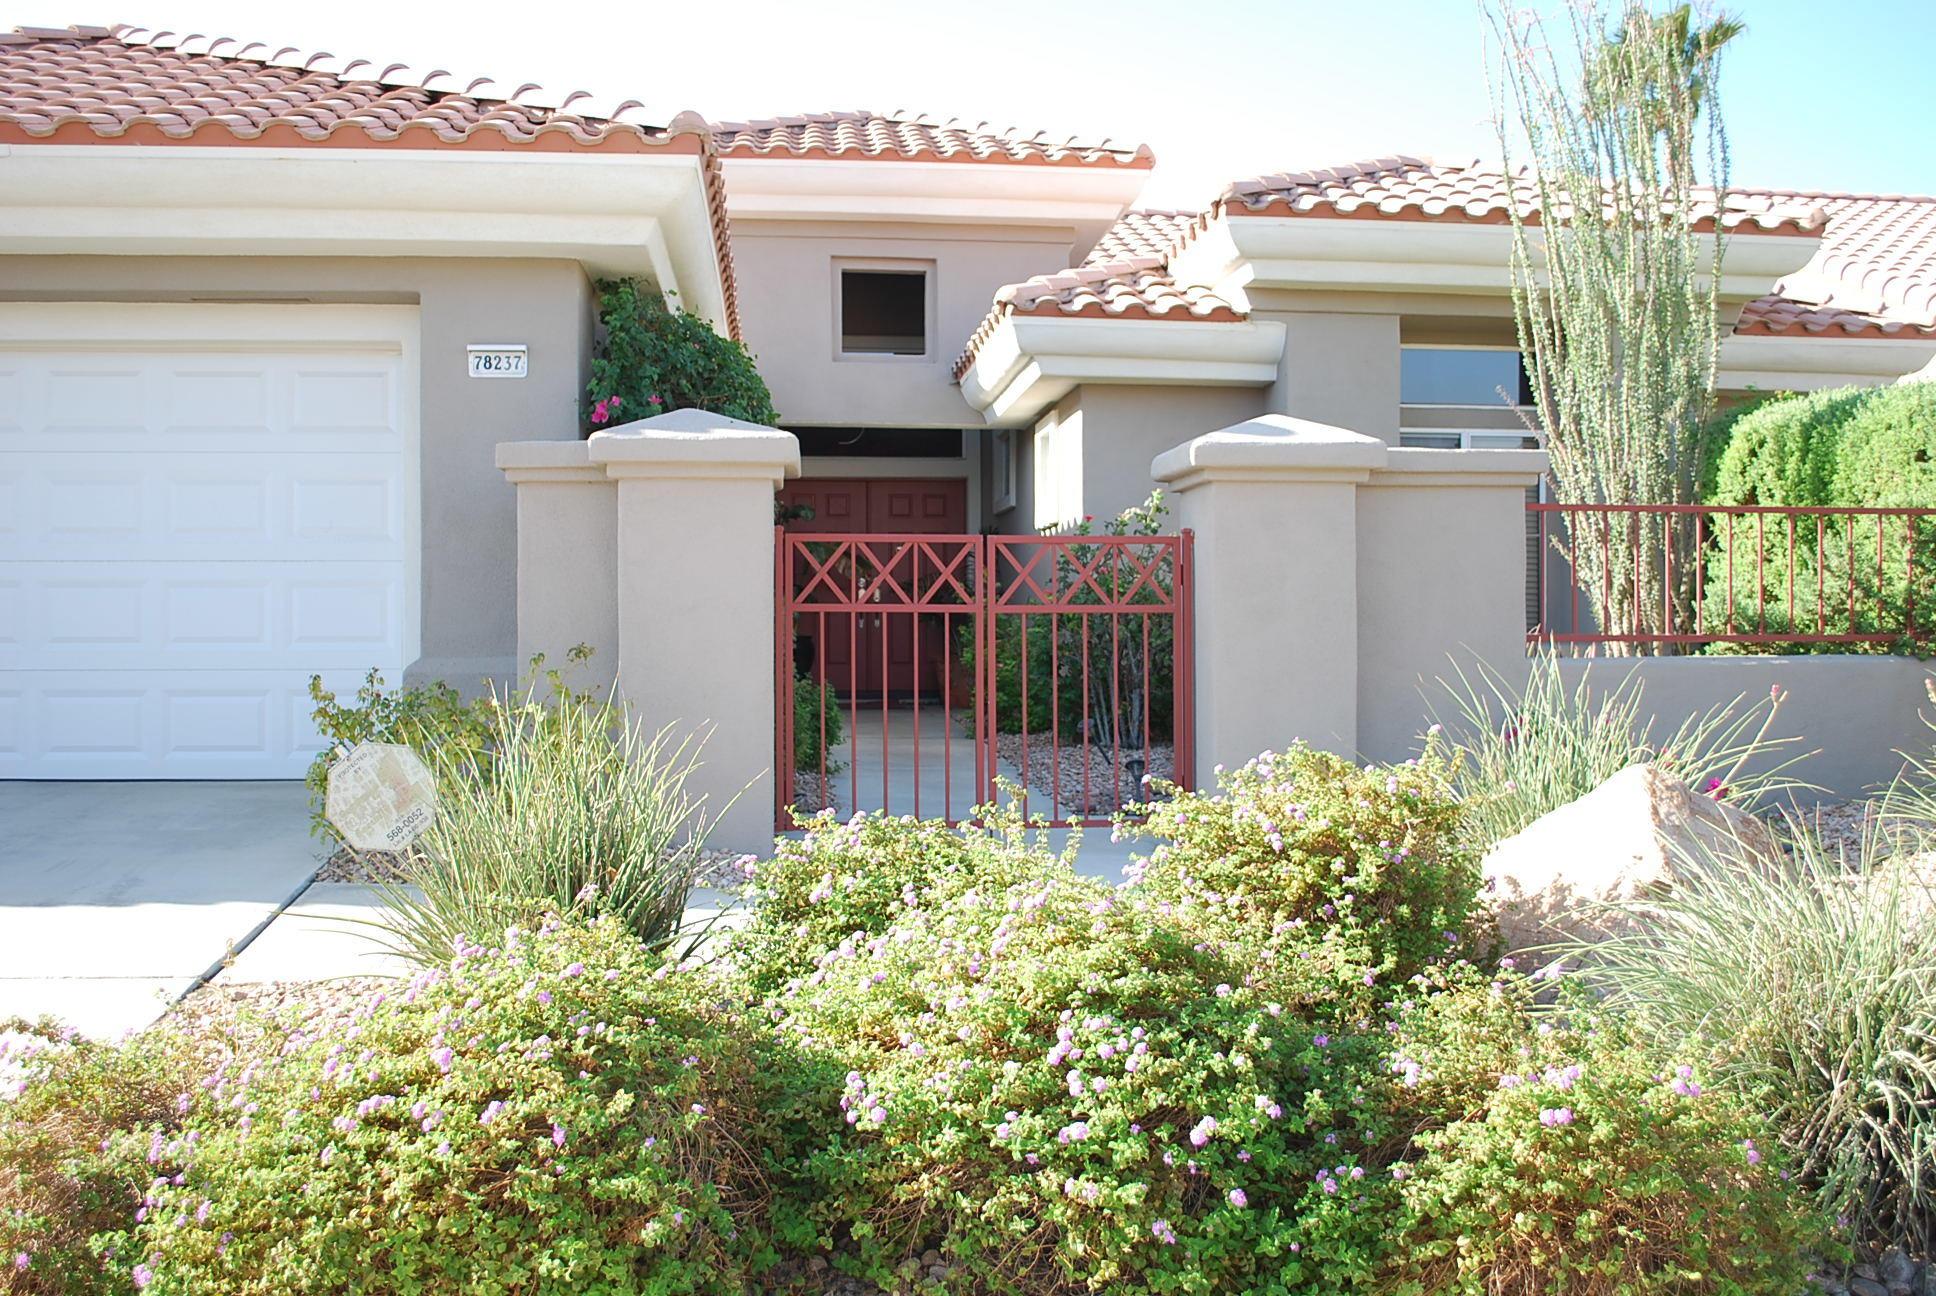 Photo of 78237 Willowrich Drive, Palm Desert, CA 92211